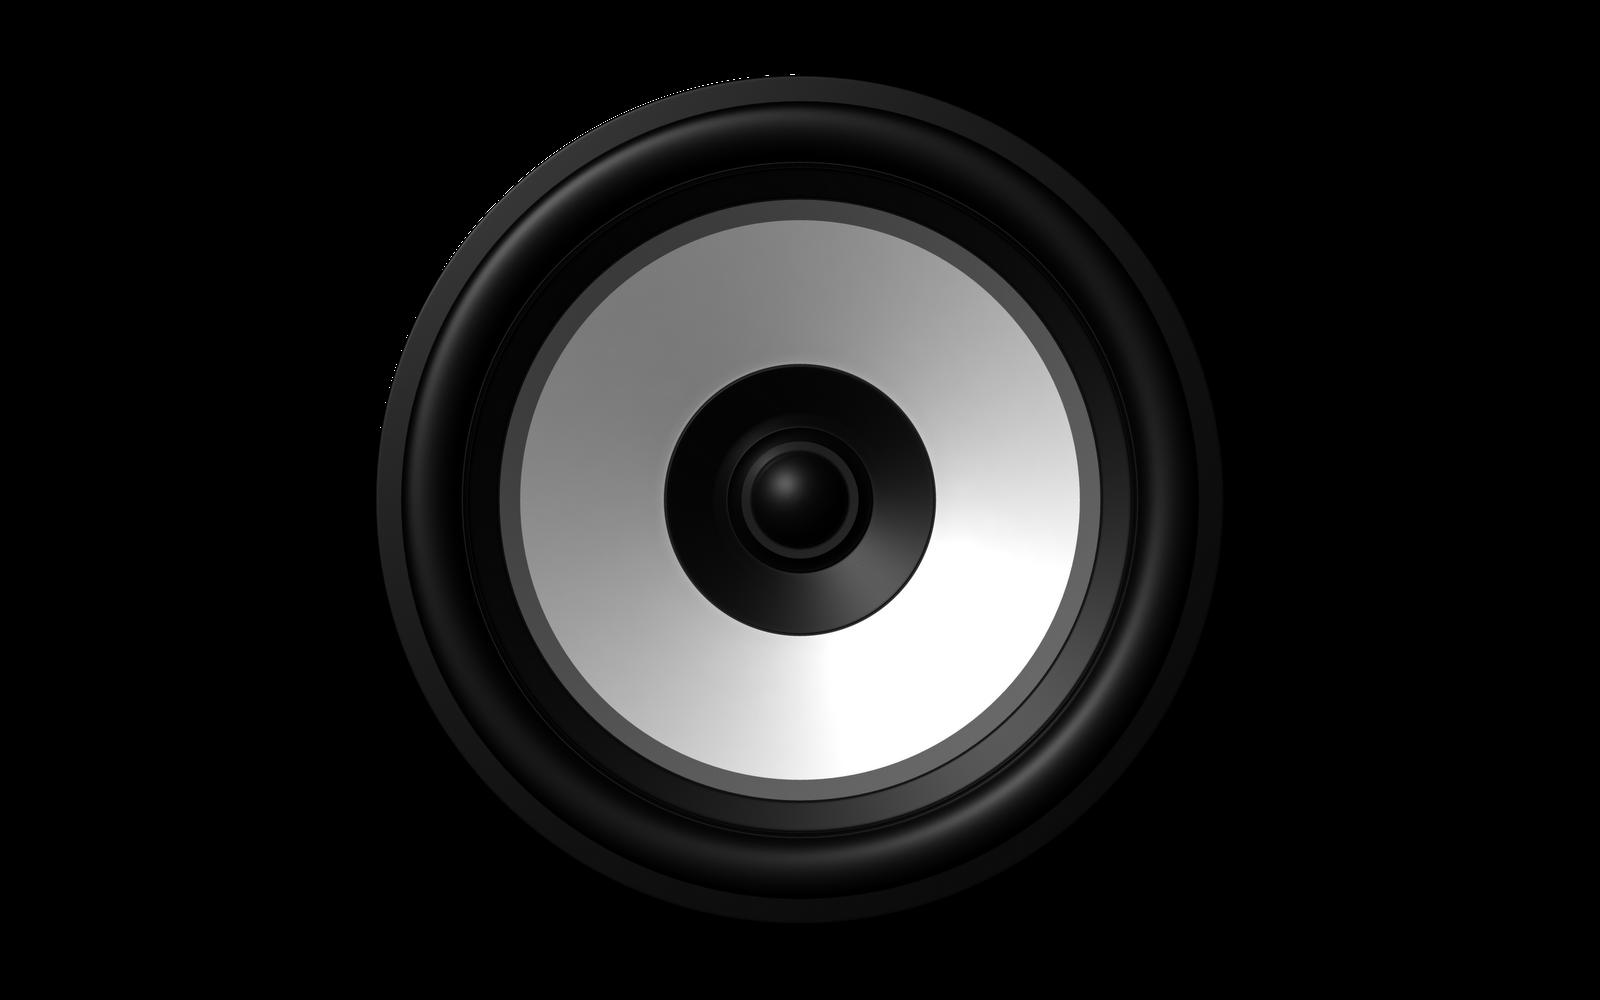 Speakers HD Music Wallpapers | Para crear flayers | Pinterest ...